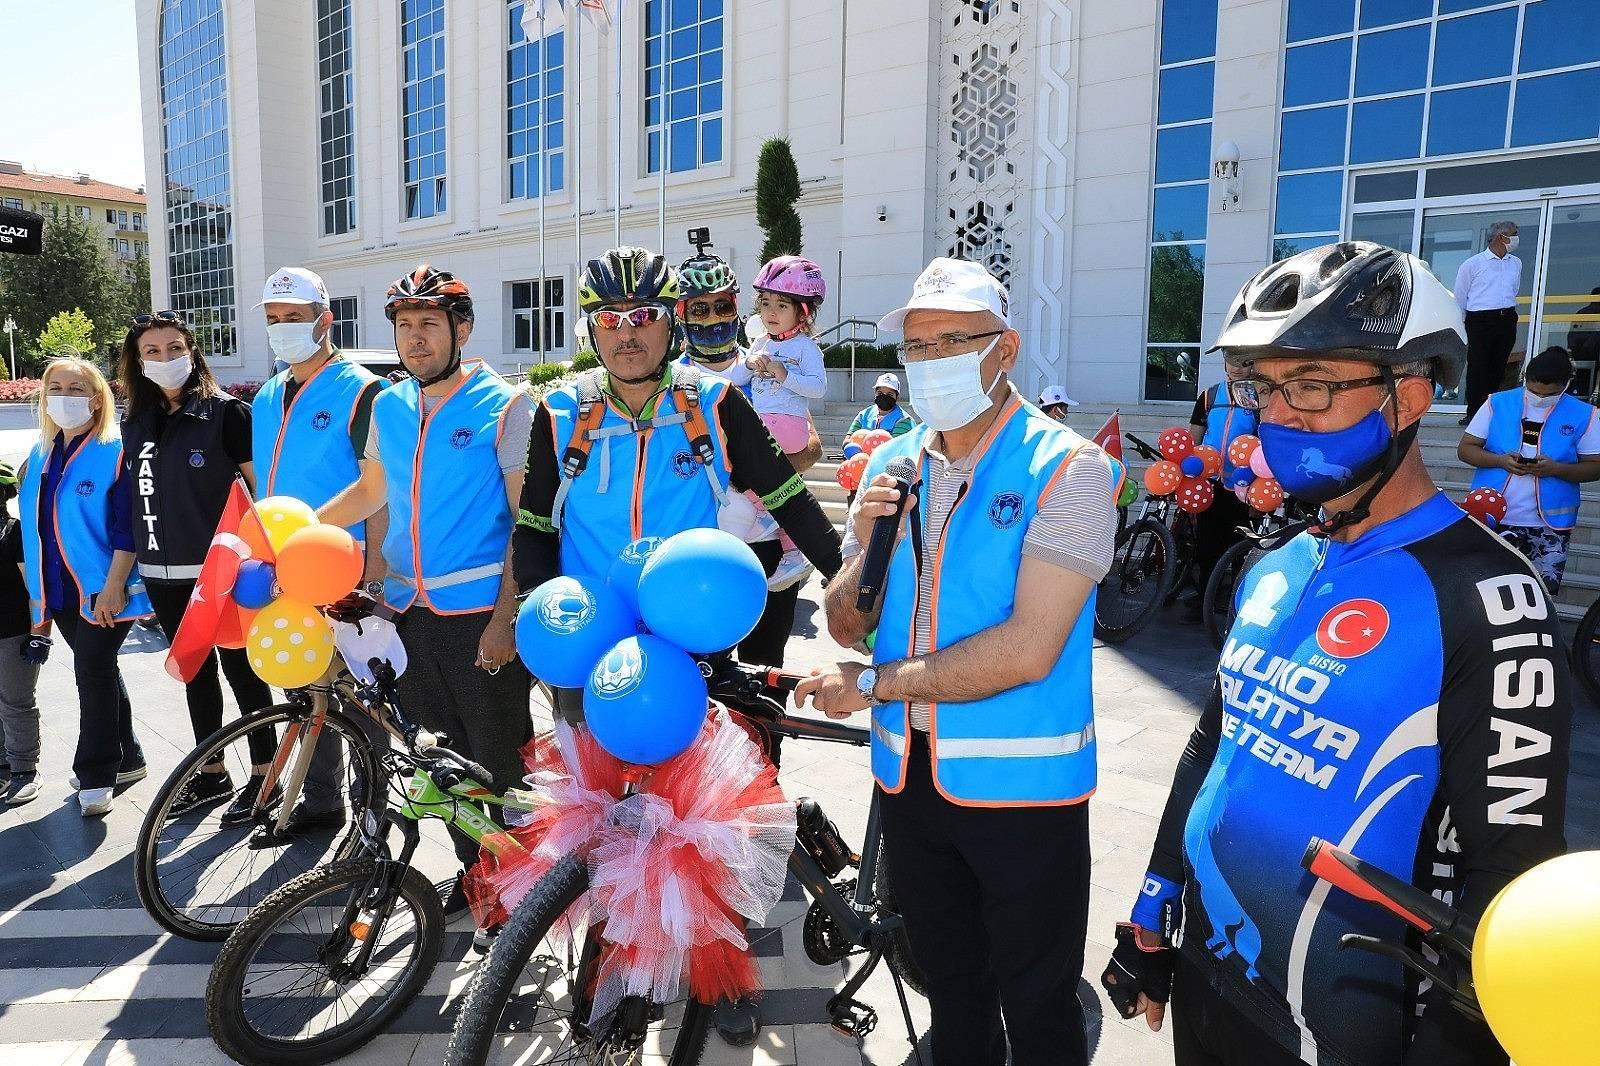 2021/06/battalgazi-belediyesinden-ozel-bisiklet-turu-etkinligi-20210606AW33-2.jpg